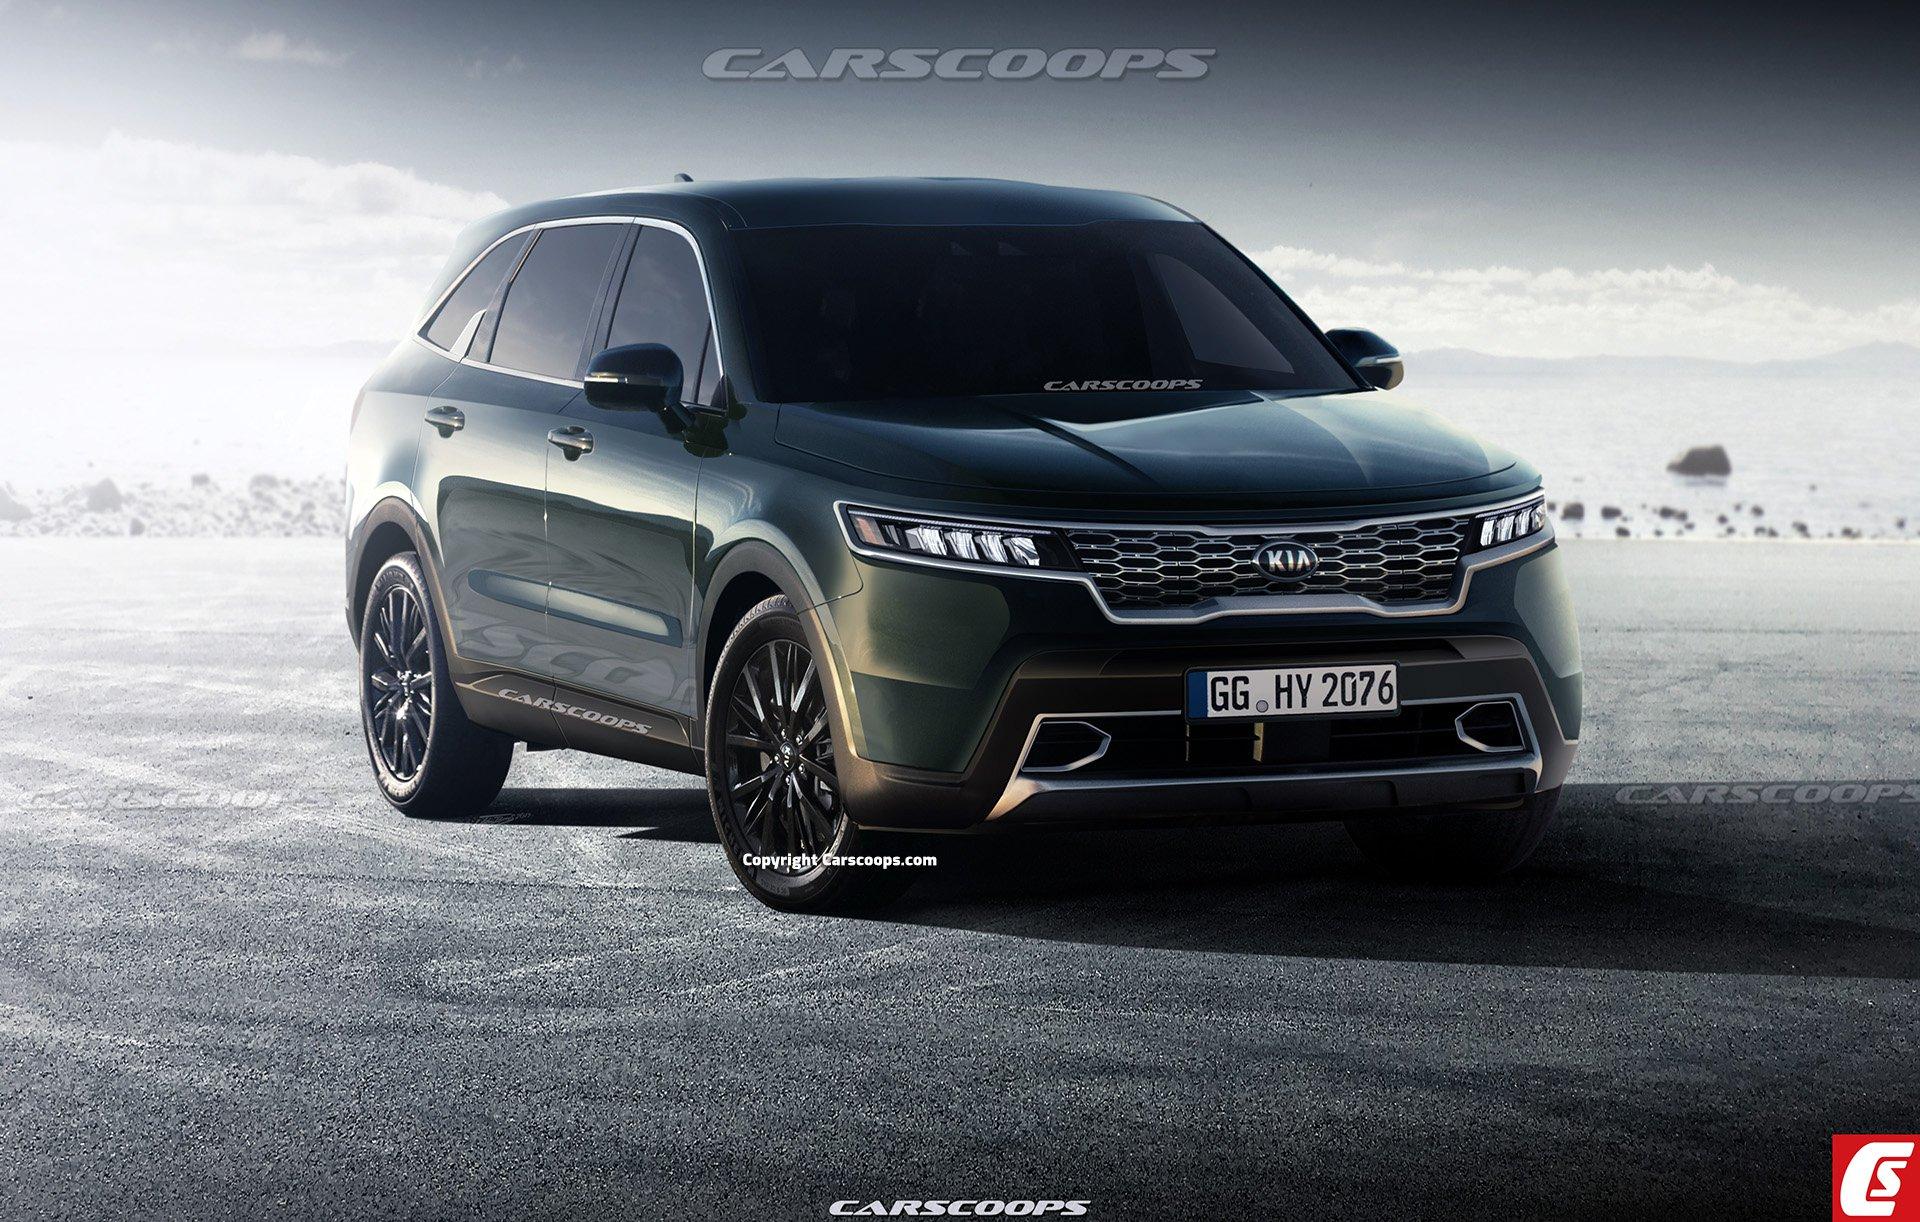 2021 Kia Sorento Render - Korean Car Blog